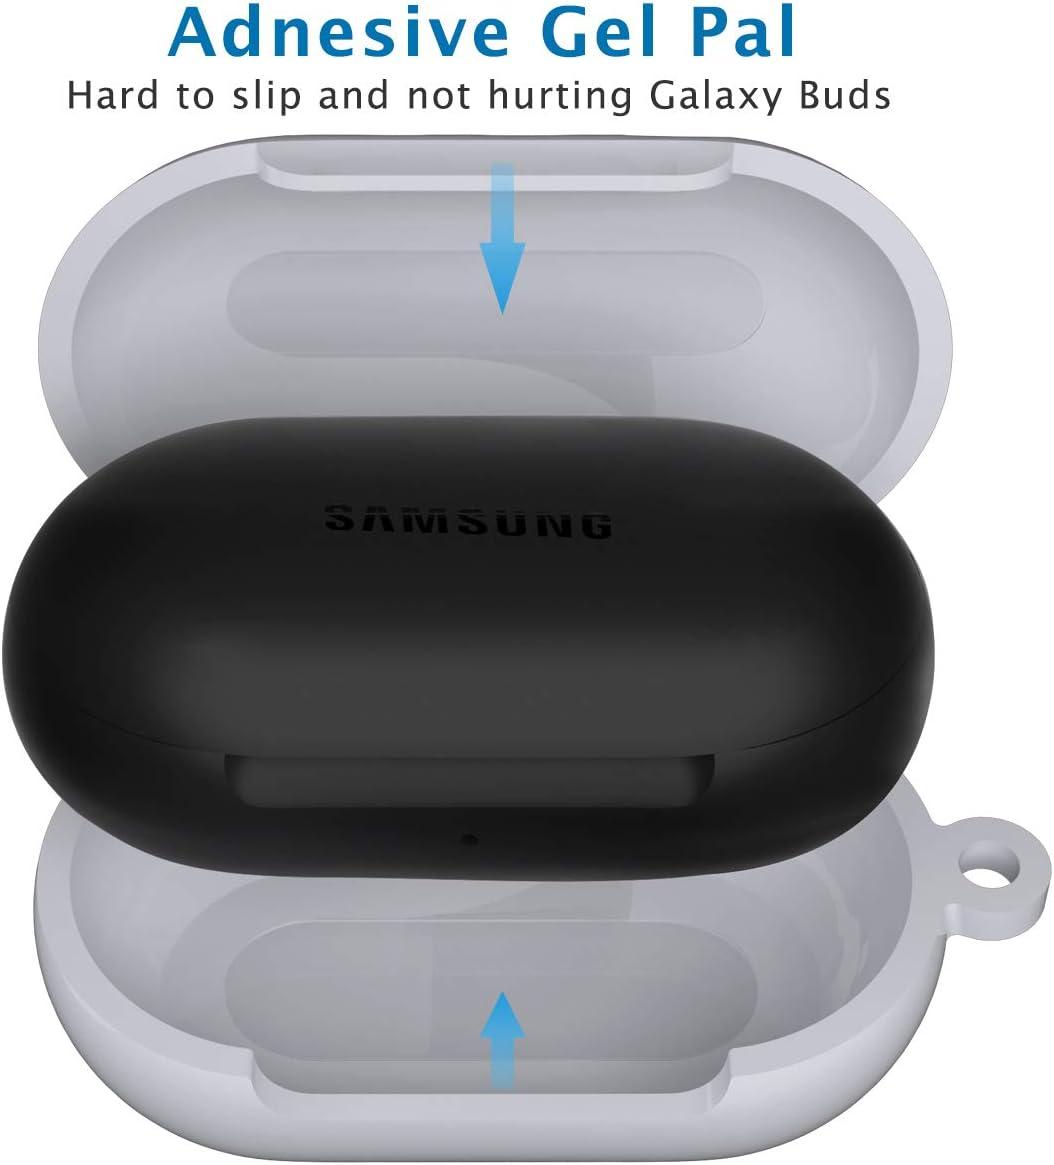 Galaxy Buds 2019,Funciona con Carga Inal/ámbrica,LED Frontal Visible,Negro Plus 2020 KMMIN 5 en 1 Carcasa Protectora Silicona para Samsung Galaxy Buds Funda de Silicona para Galaxy Buds